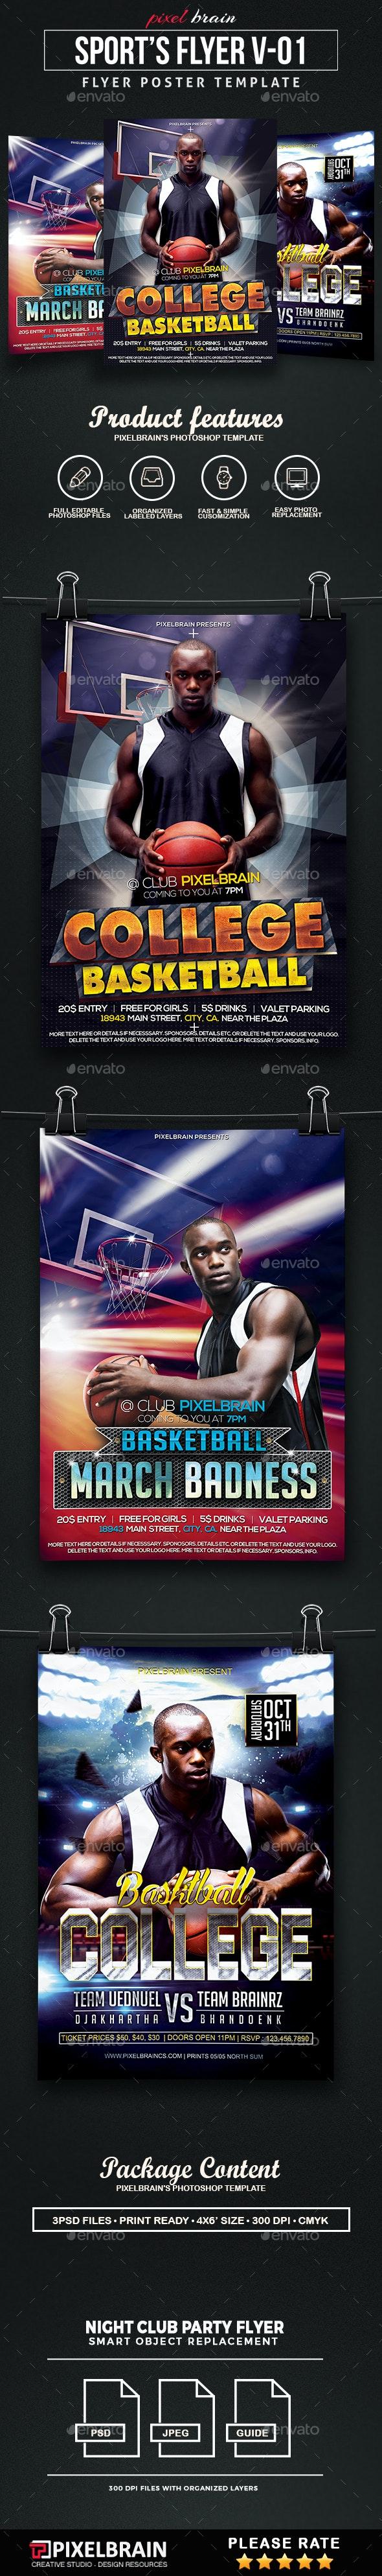 Sports Event Party Flyer Template Bundle Vol - 01 - Sports Events